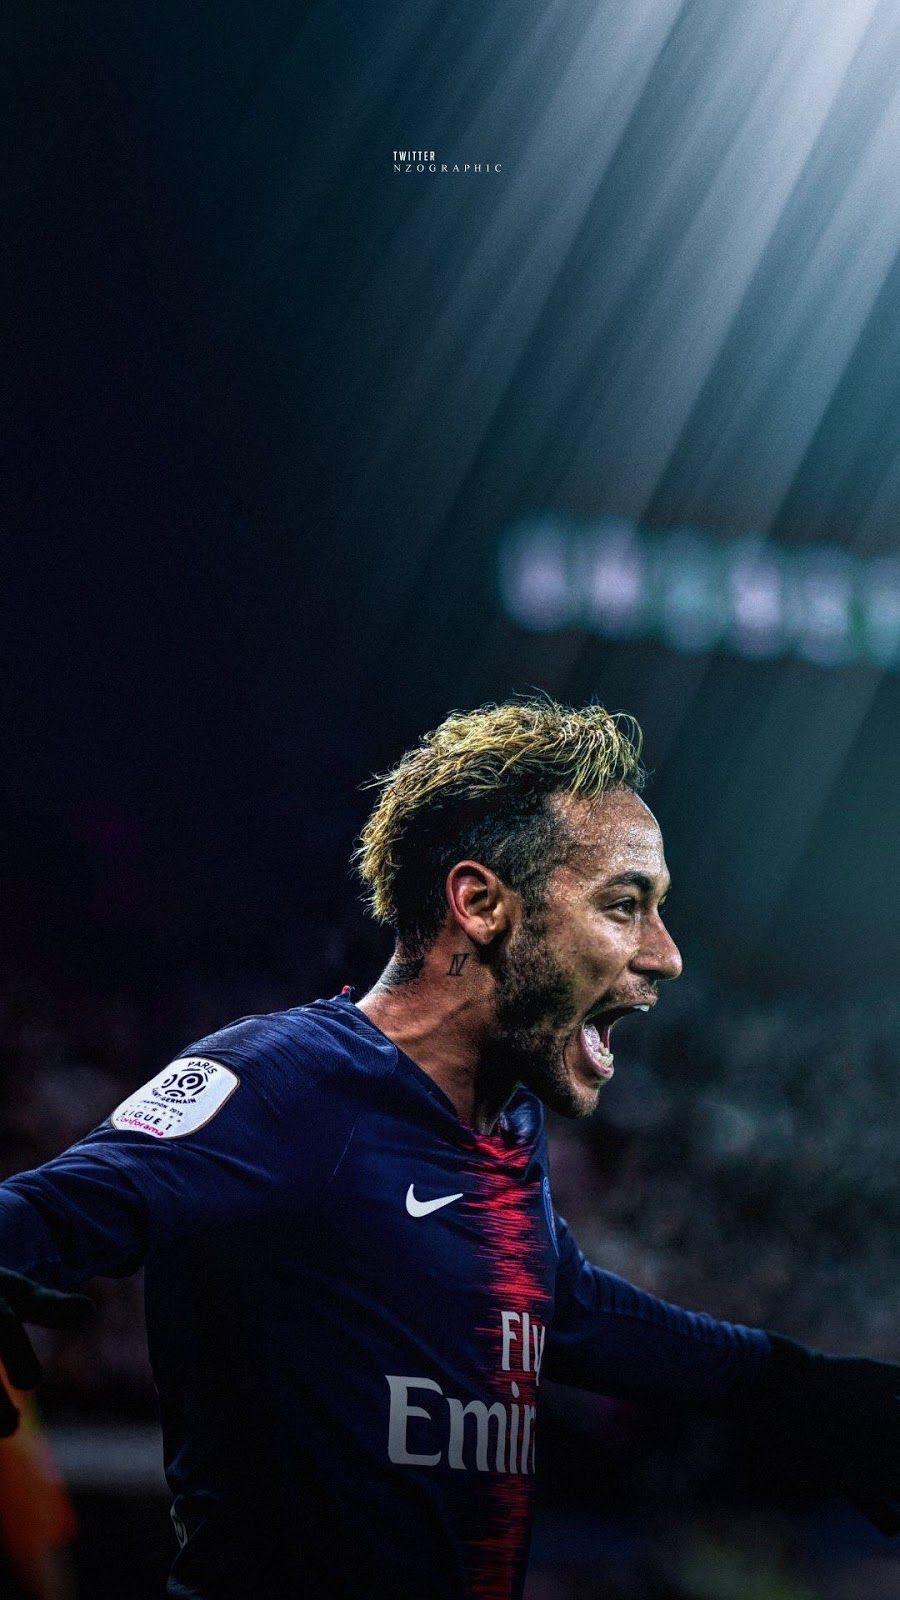 Neymar Jr Hd Images 2019 Neymar Jr Neymar Football Neymar